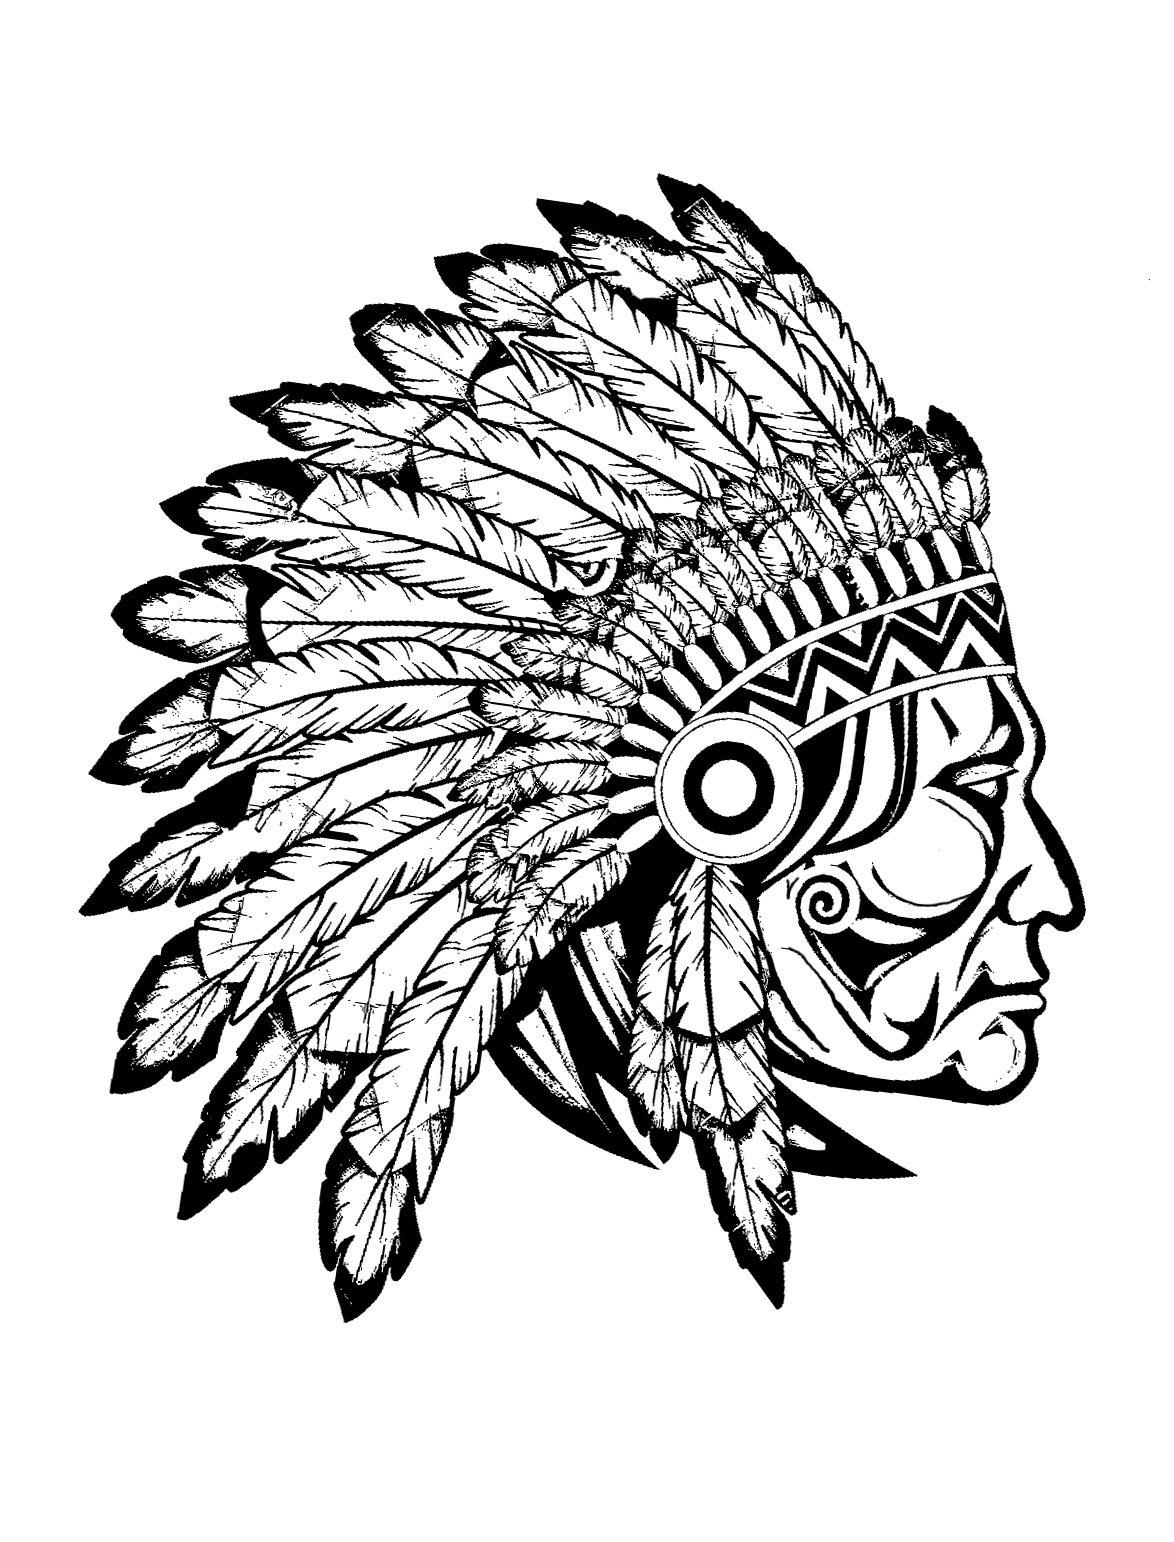 1174x1542 Indian Native Chief Profile Native American